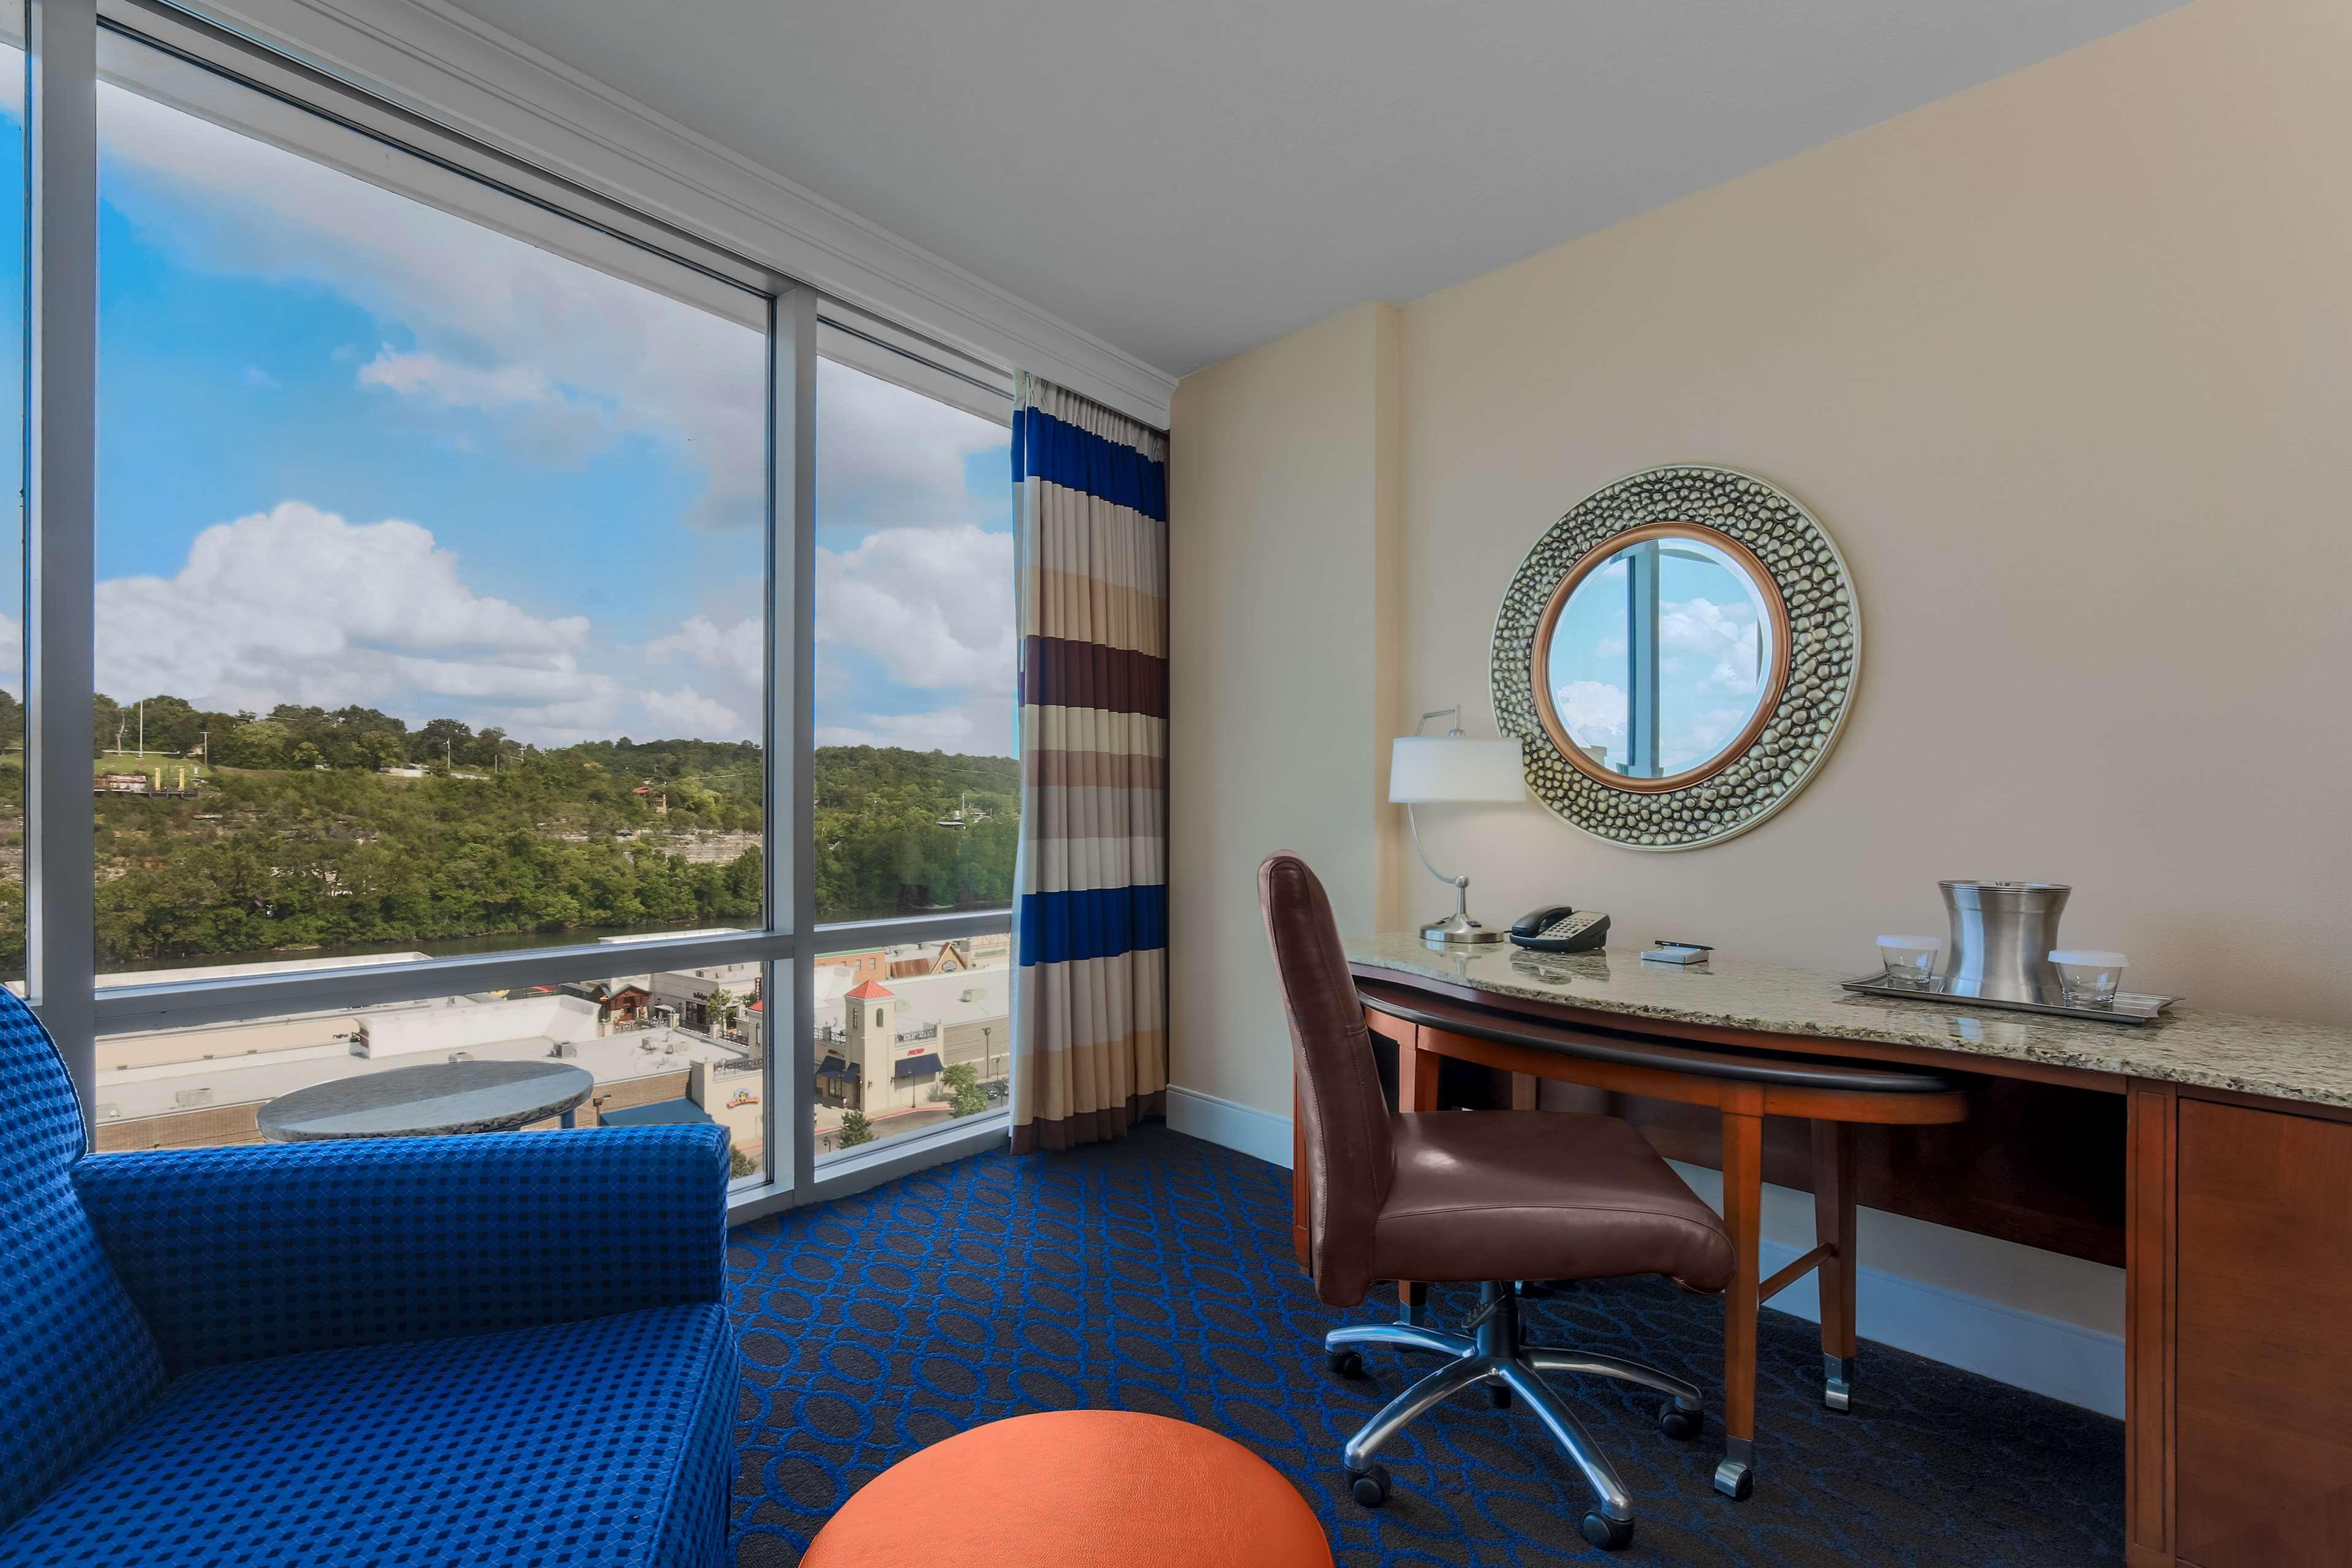 Hilton Branson Convention Center image 27